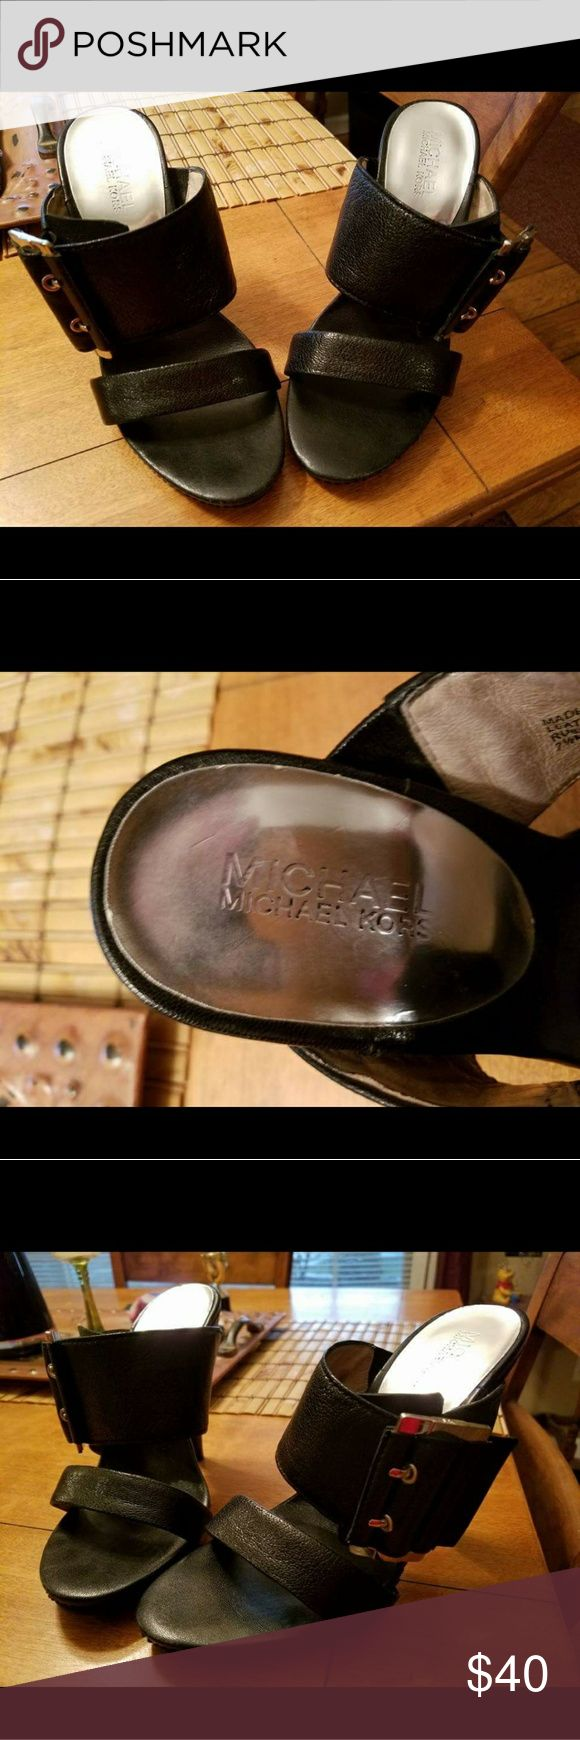 Michael Kors heels Michael Kors heels size 7.5 Michael Kors Shoes Heels